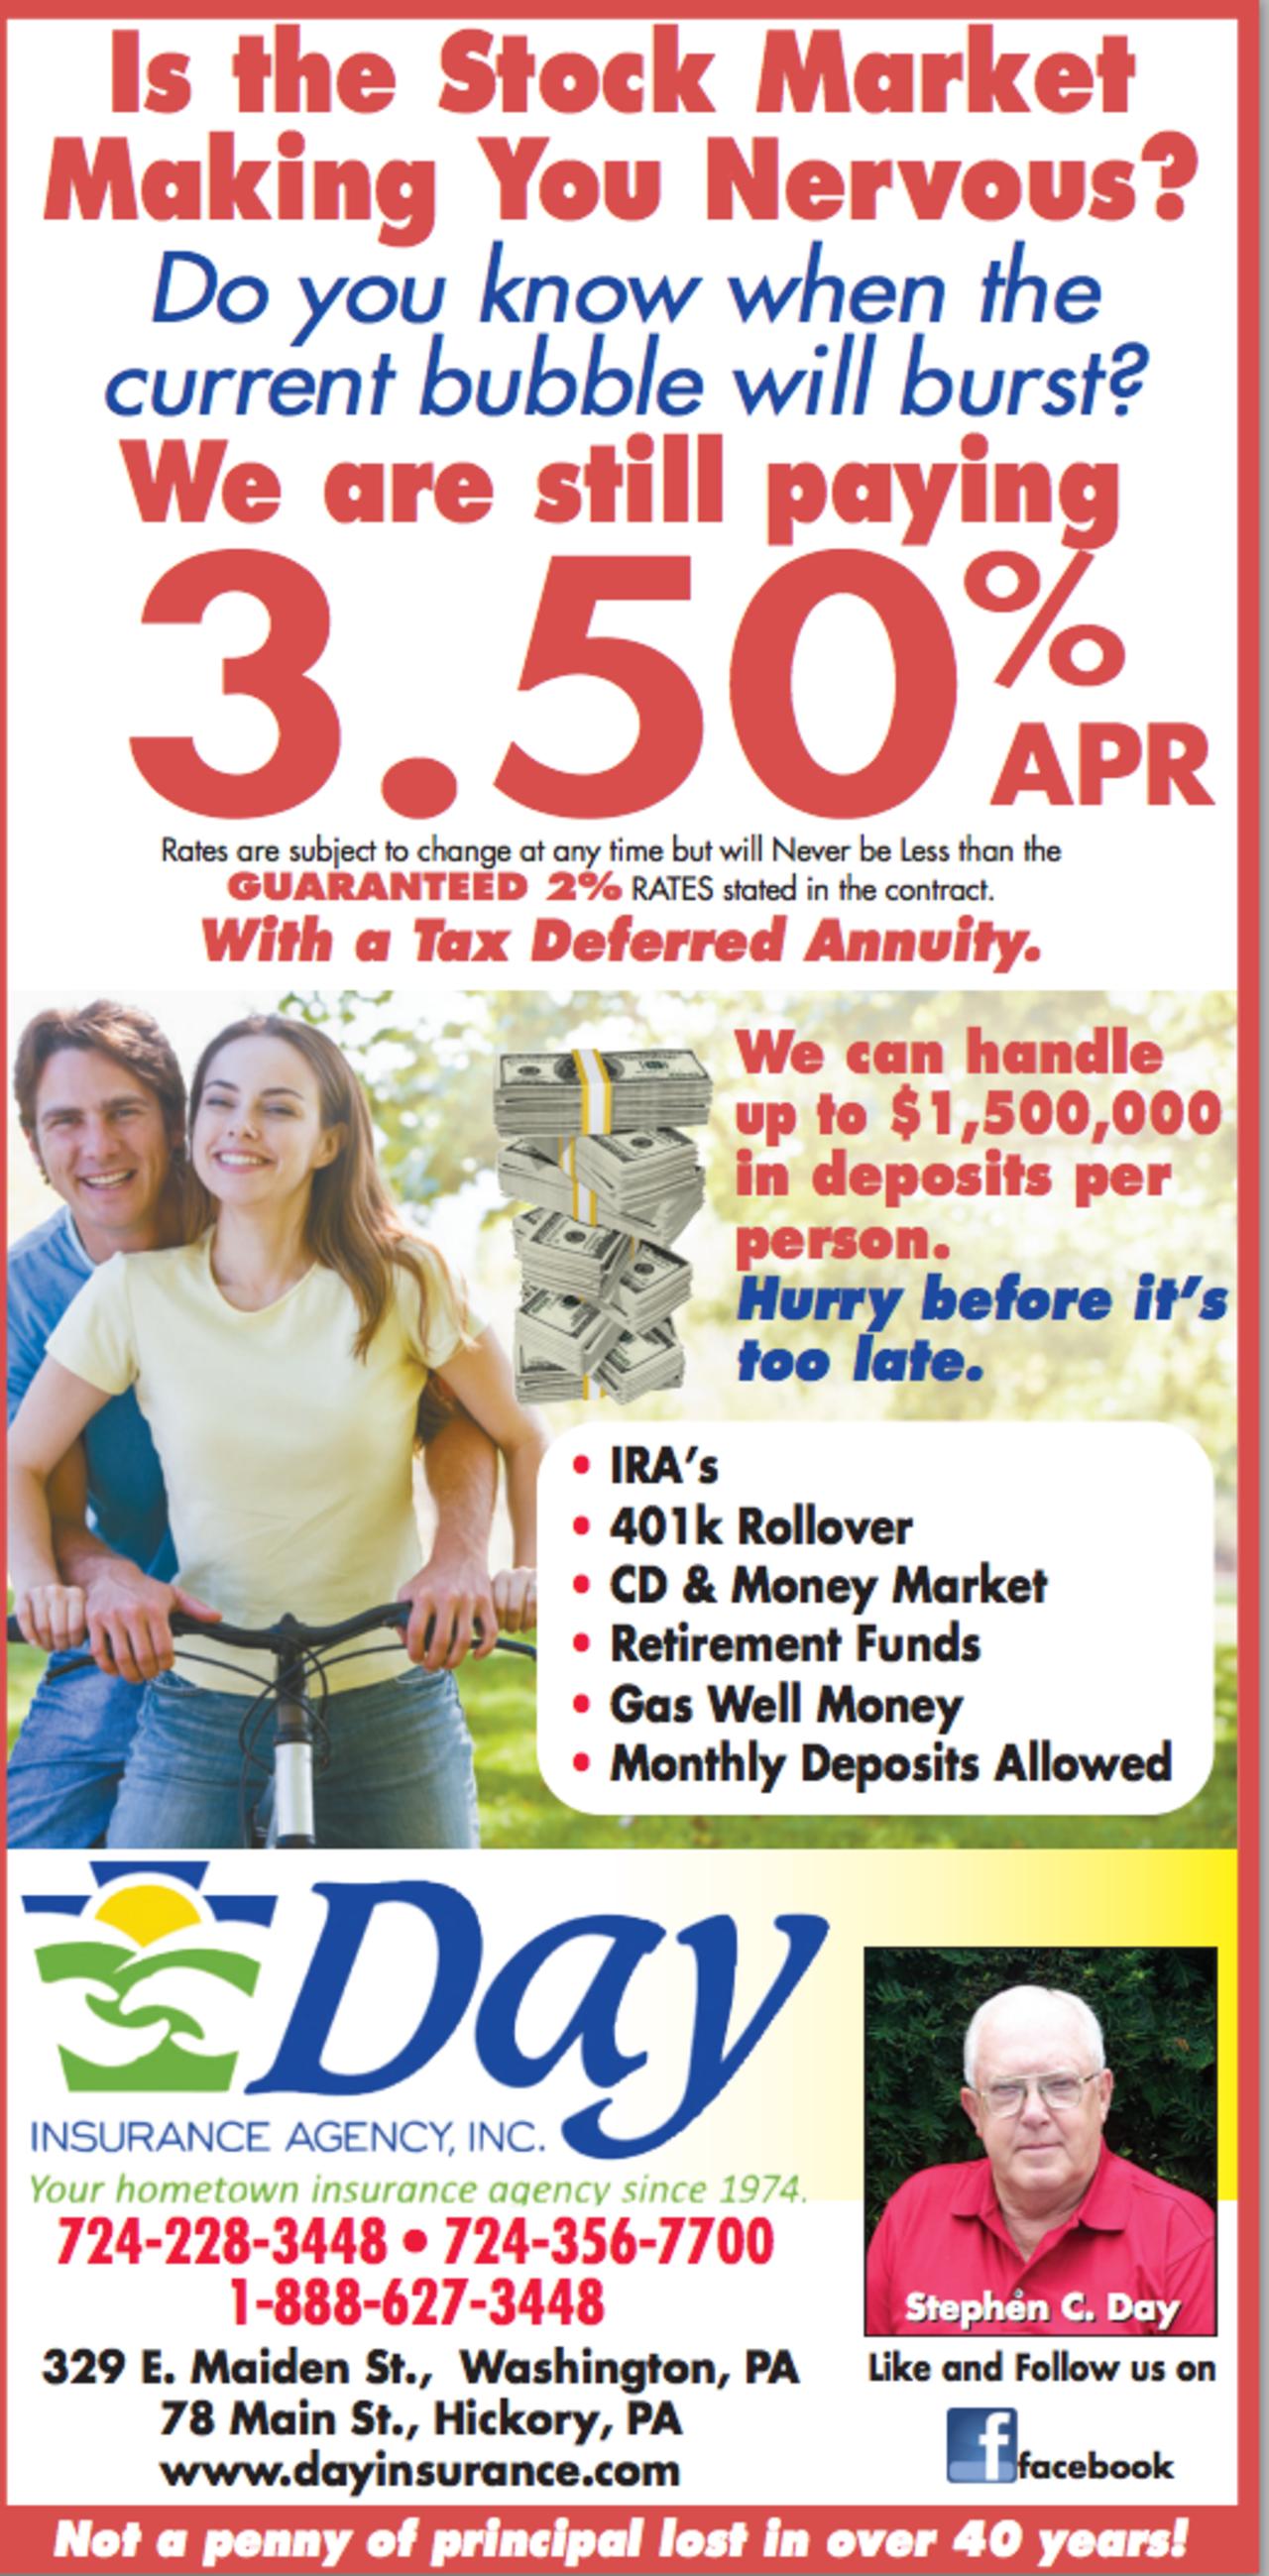 Day Insurance Agency, Inc. - Insurance - Insurance Brokers in Washington PA